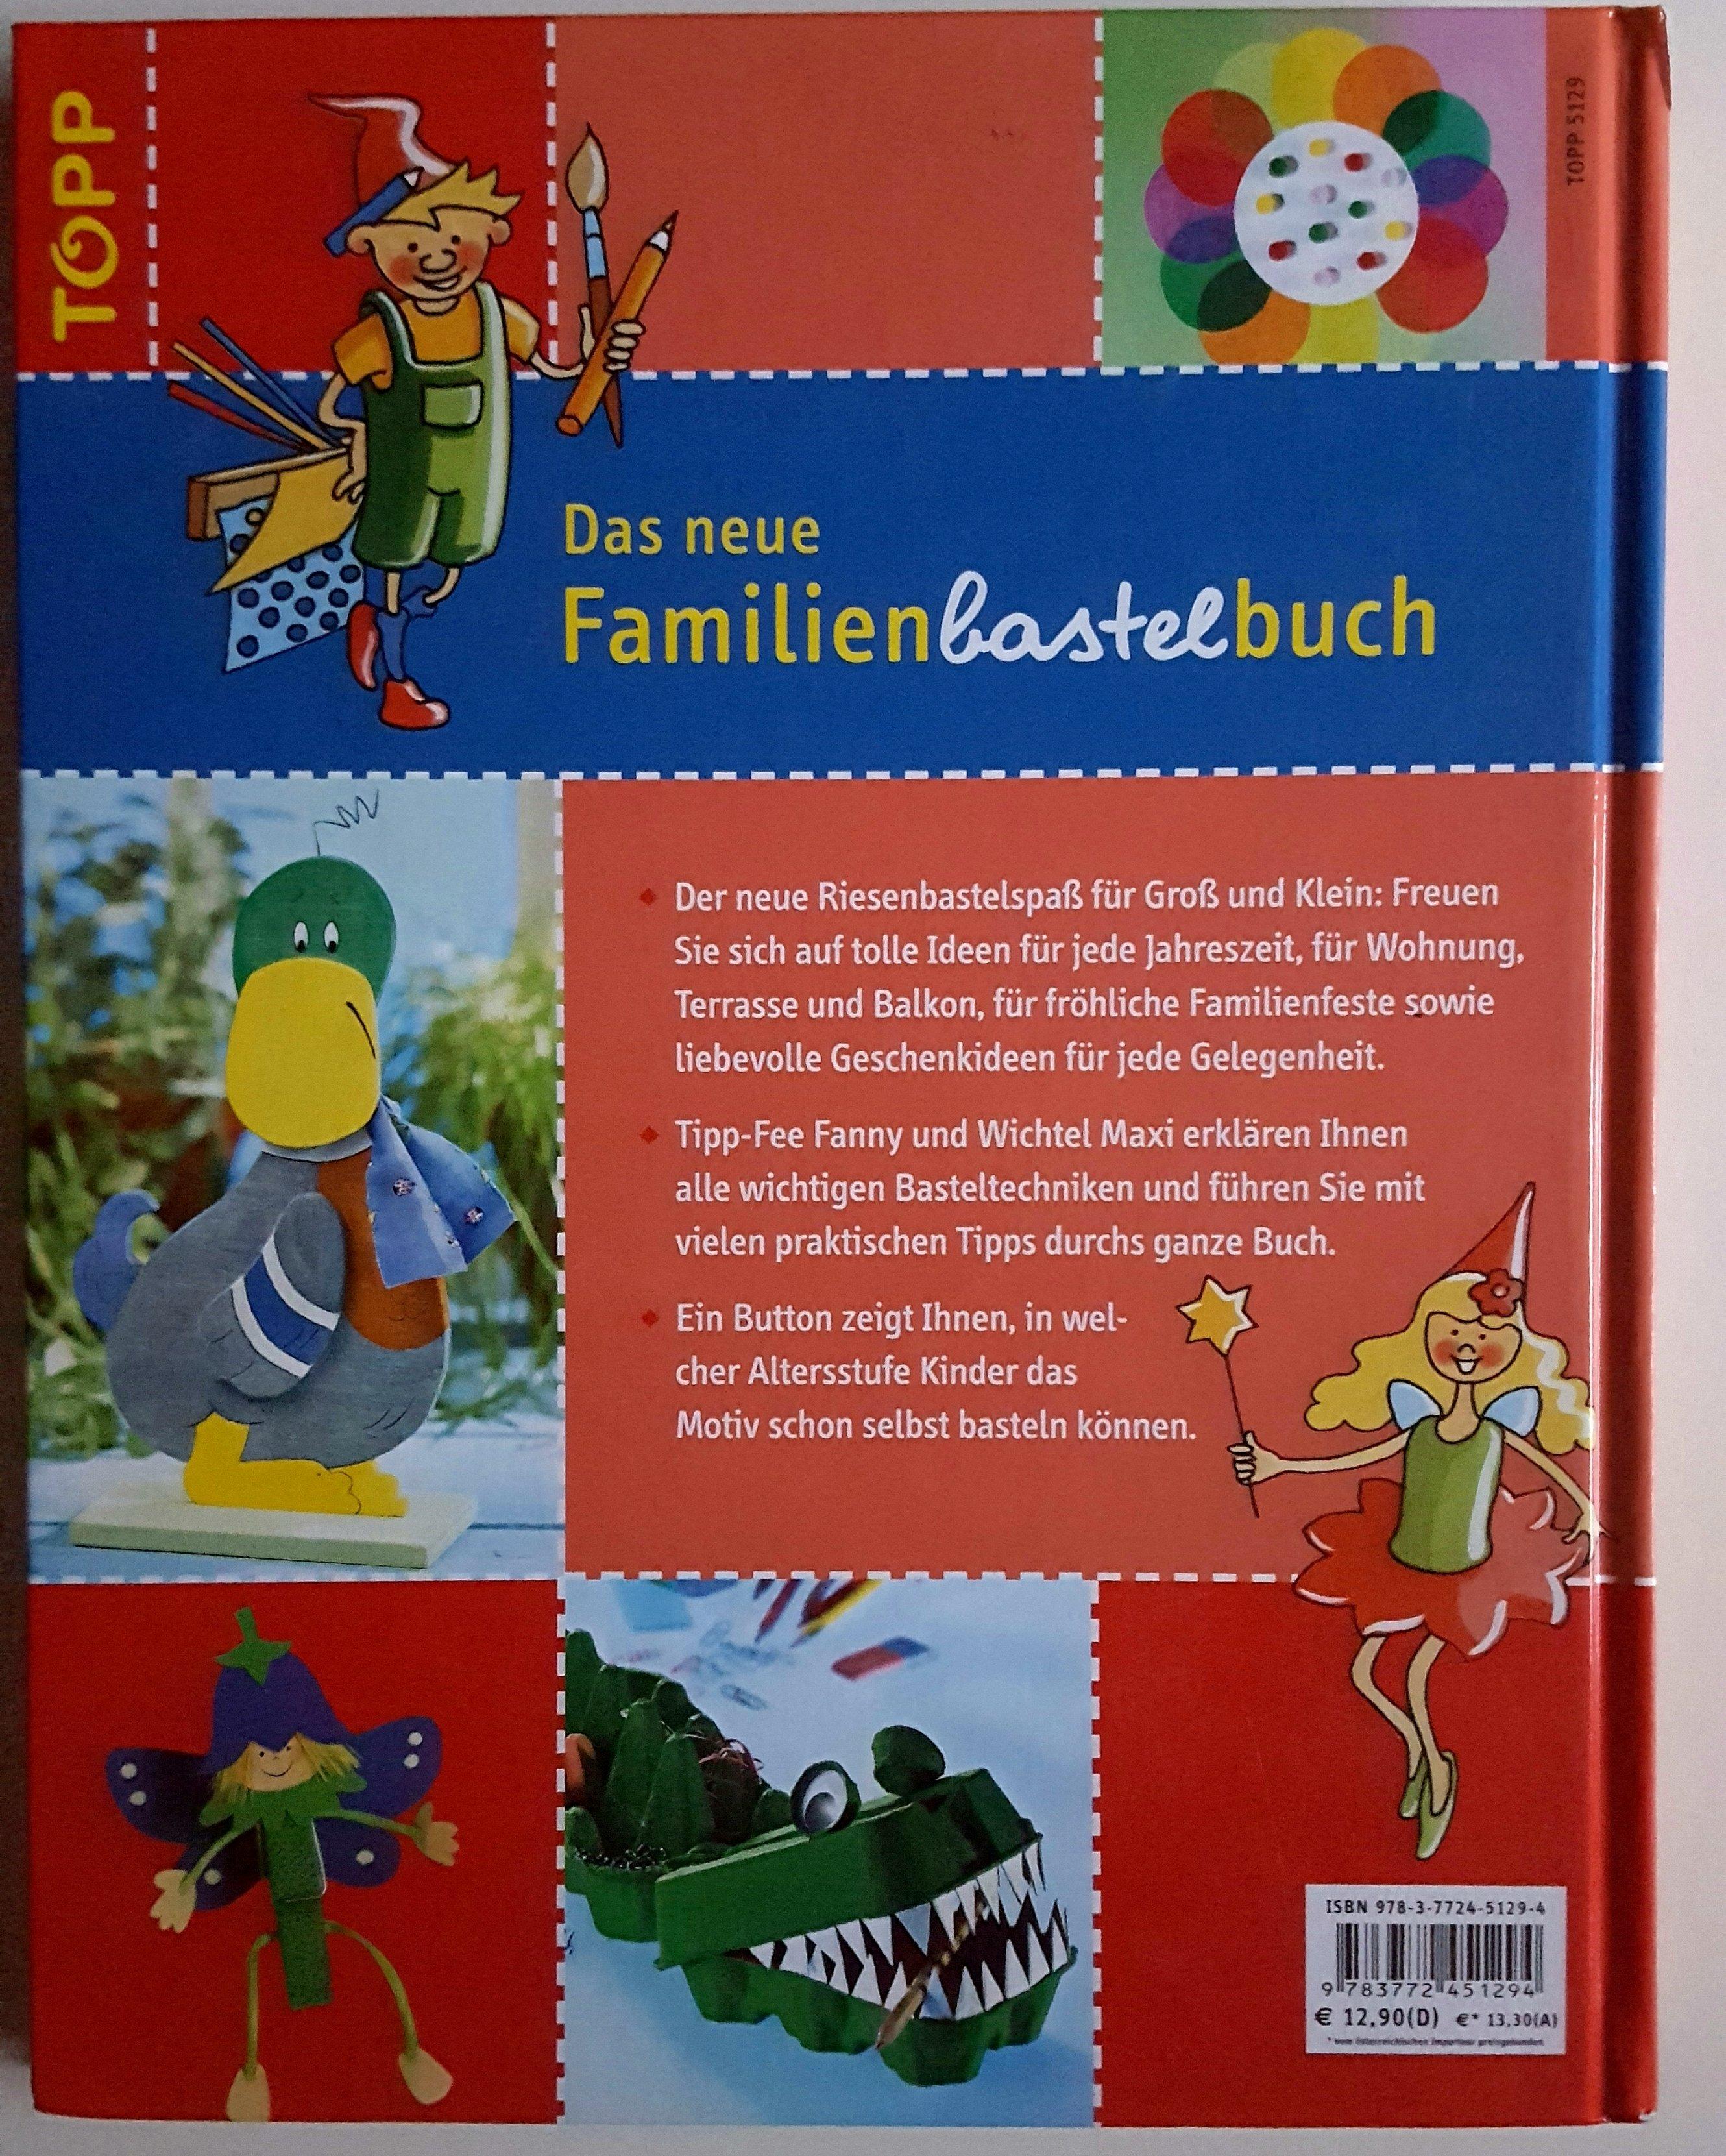 Das neue Familienbastelbuch